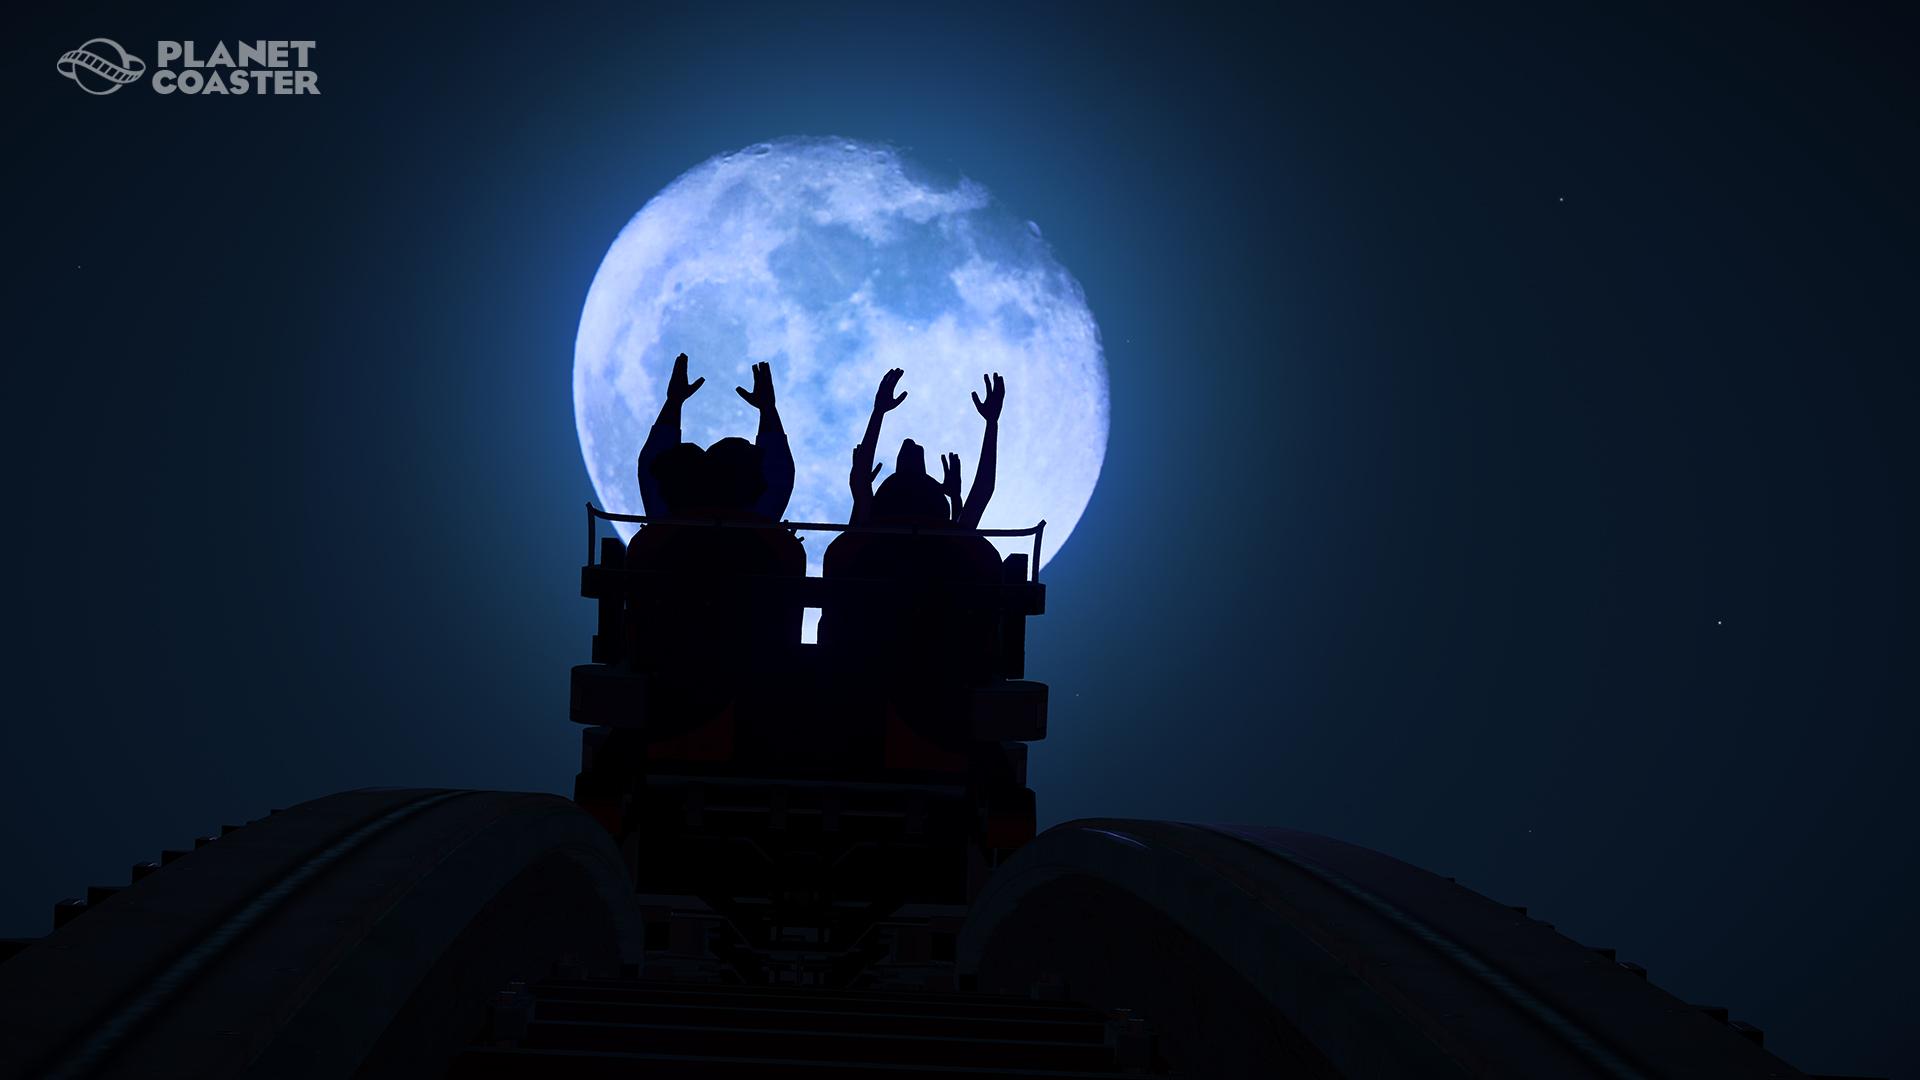 Planet Coaster night ride